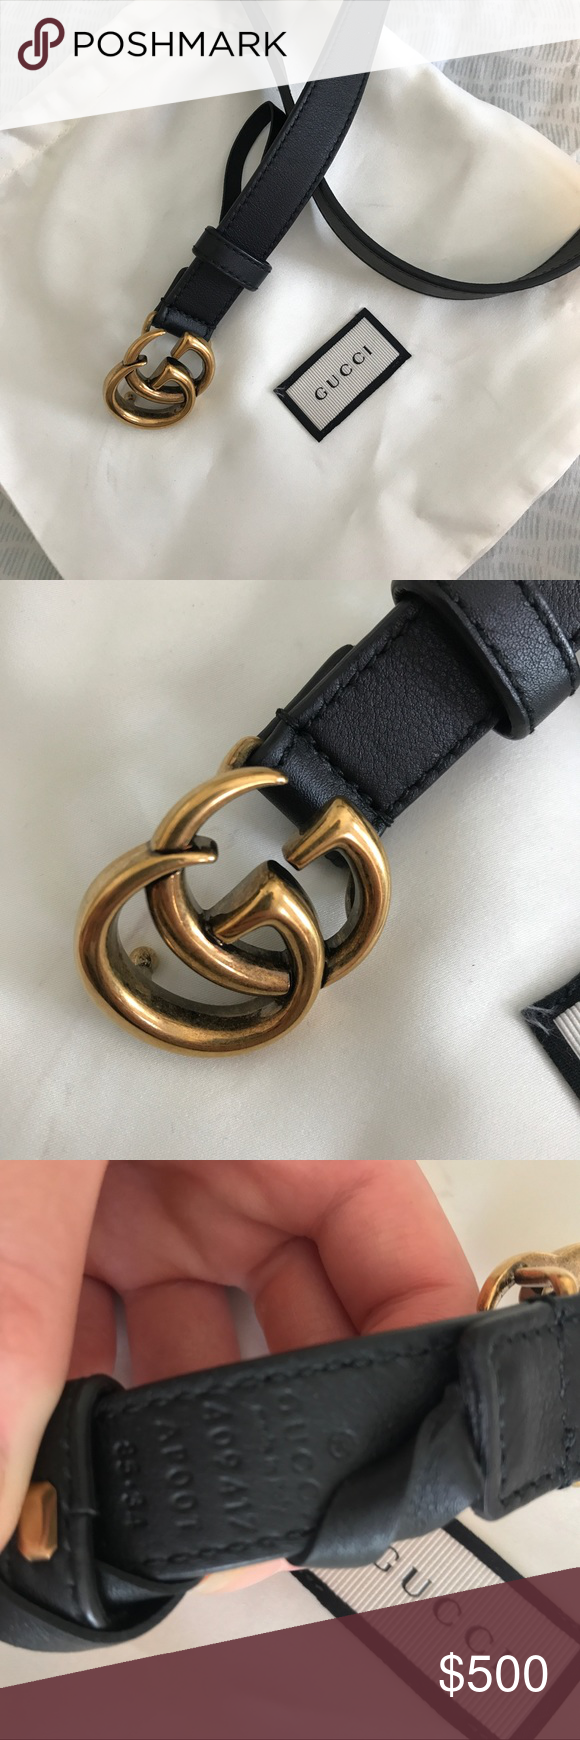 2c467f1718d Authentic Gucci Double G Marmont Belt 100% Authentic Gucci Belt. (I have  email